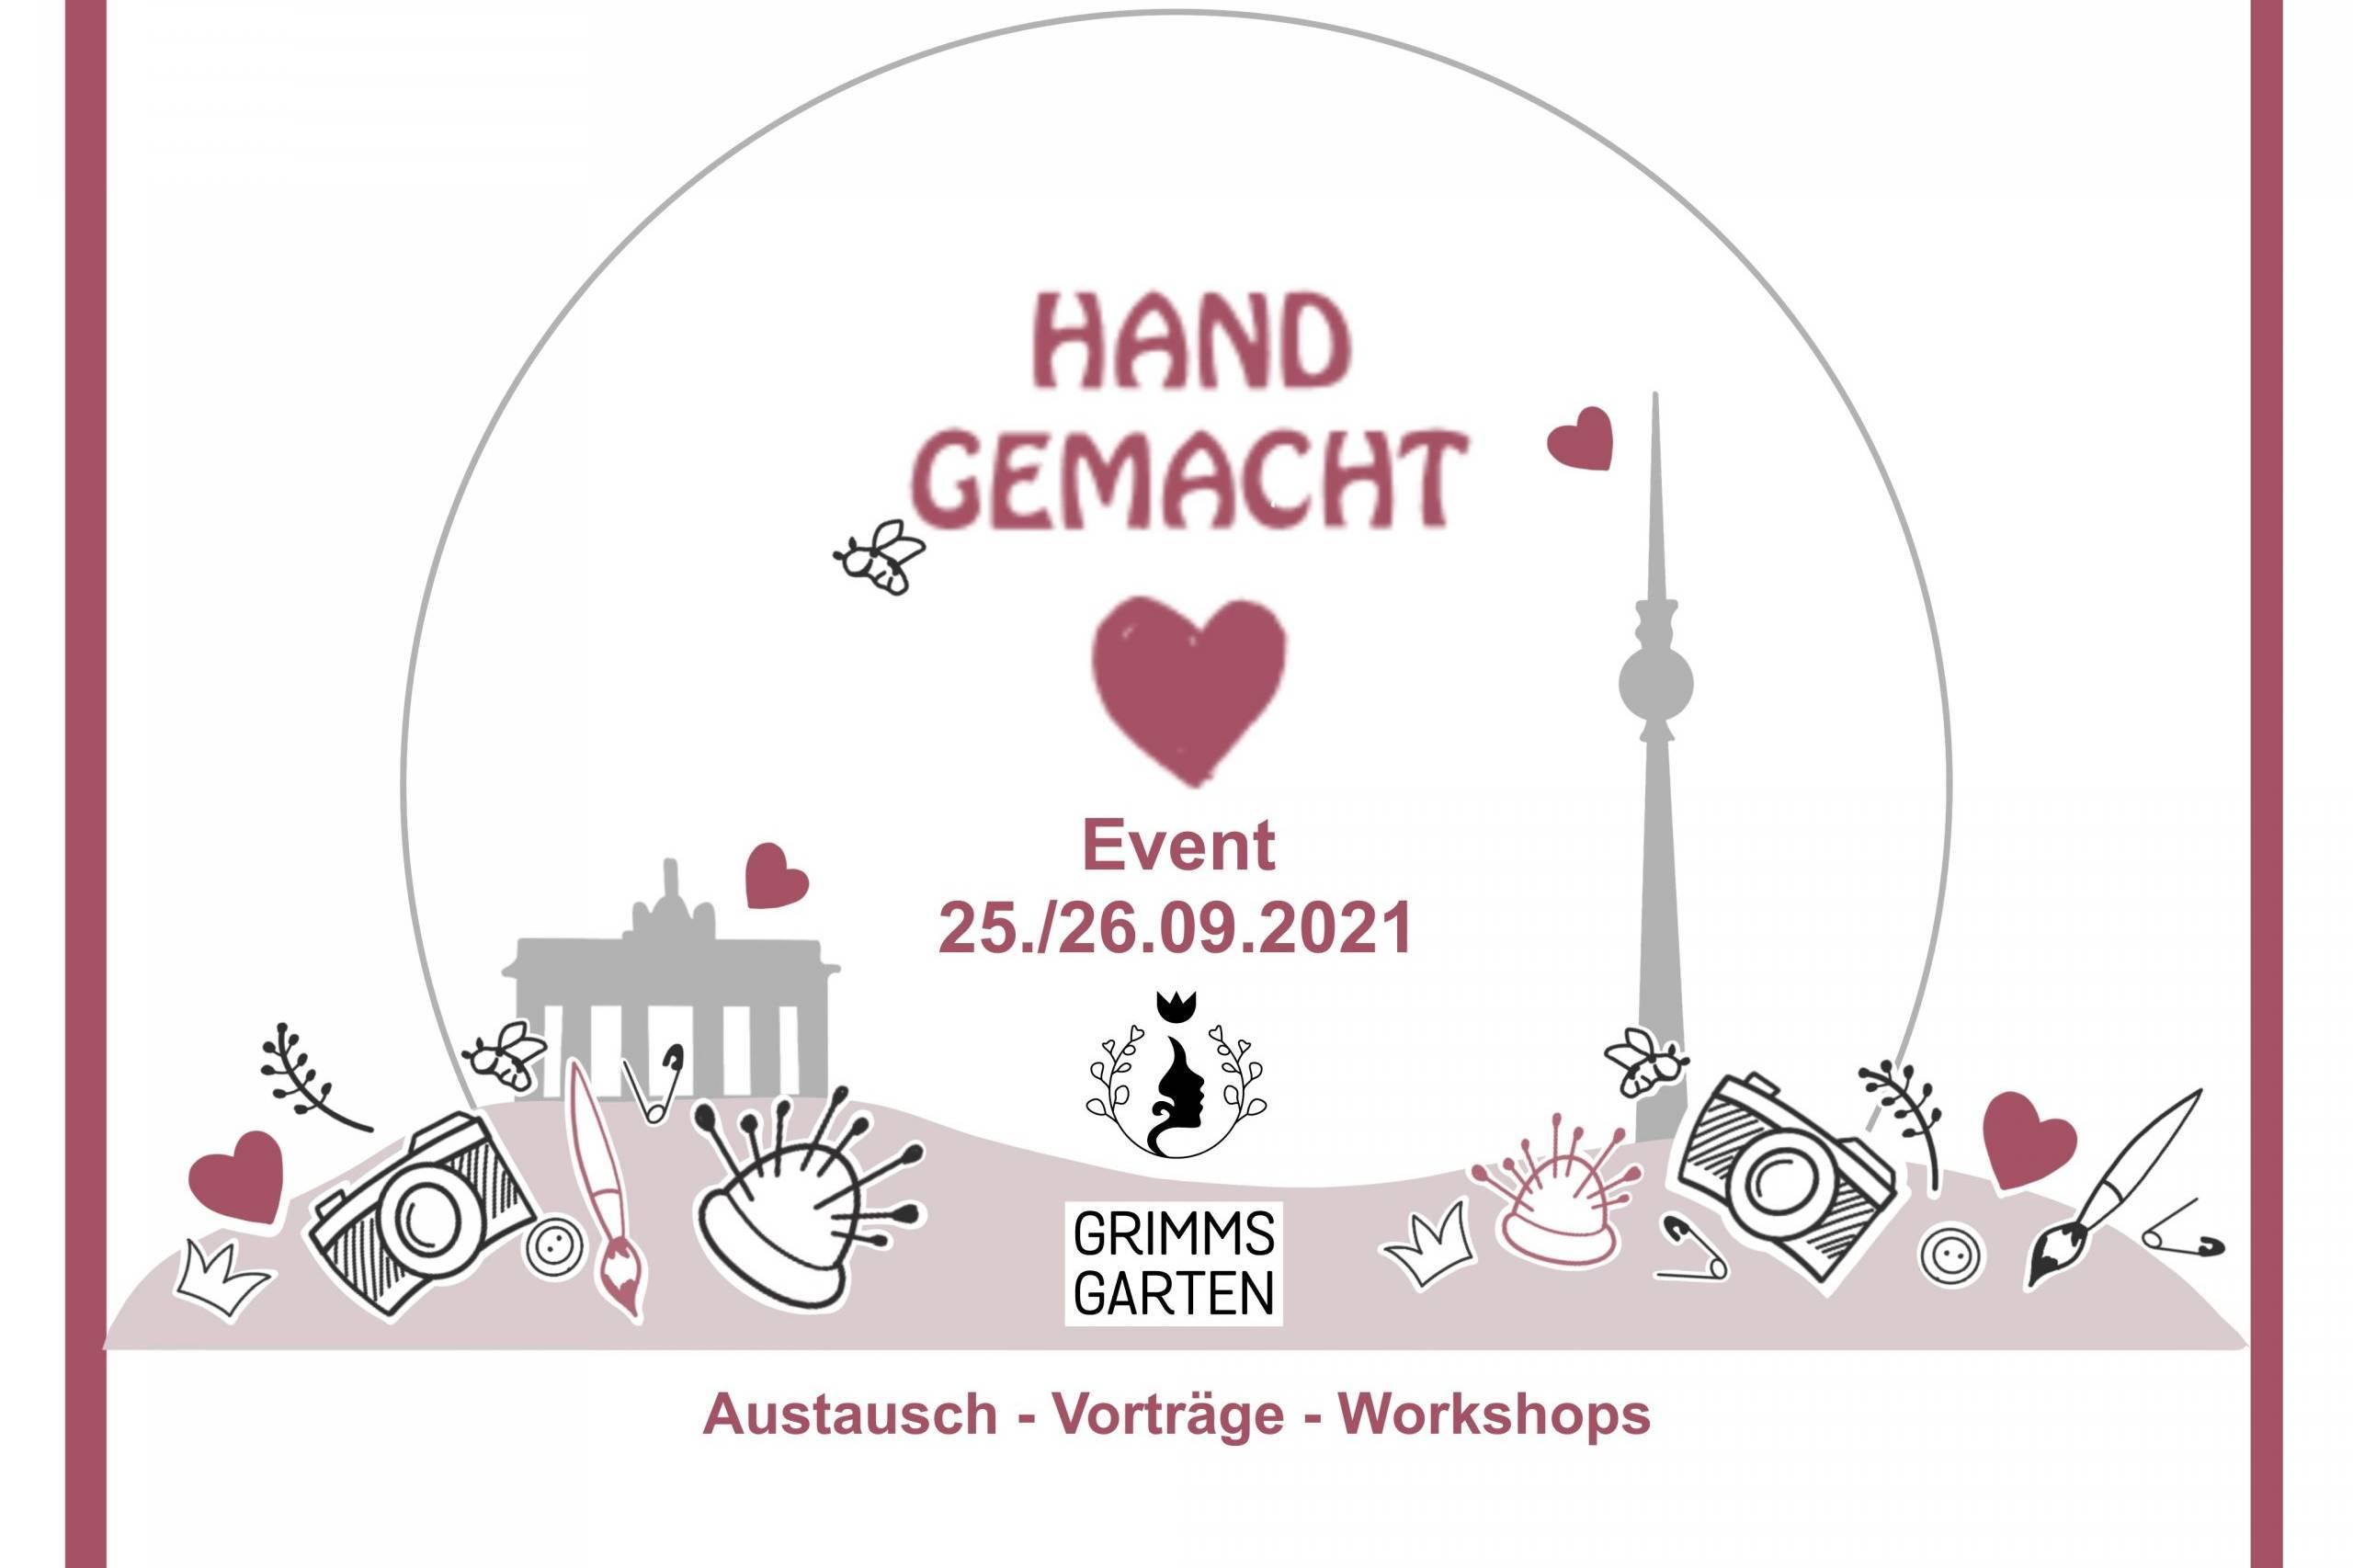 Event Berlin Handgemacht